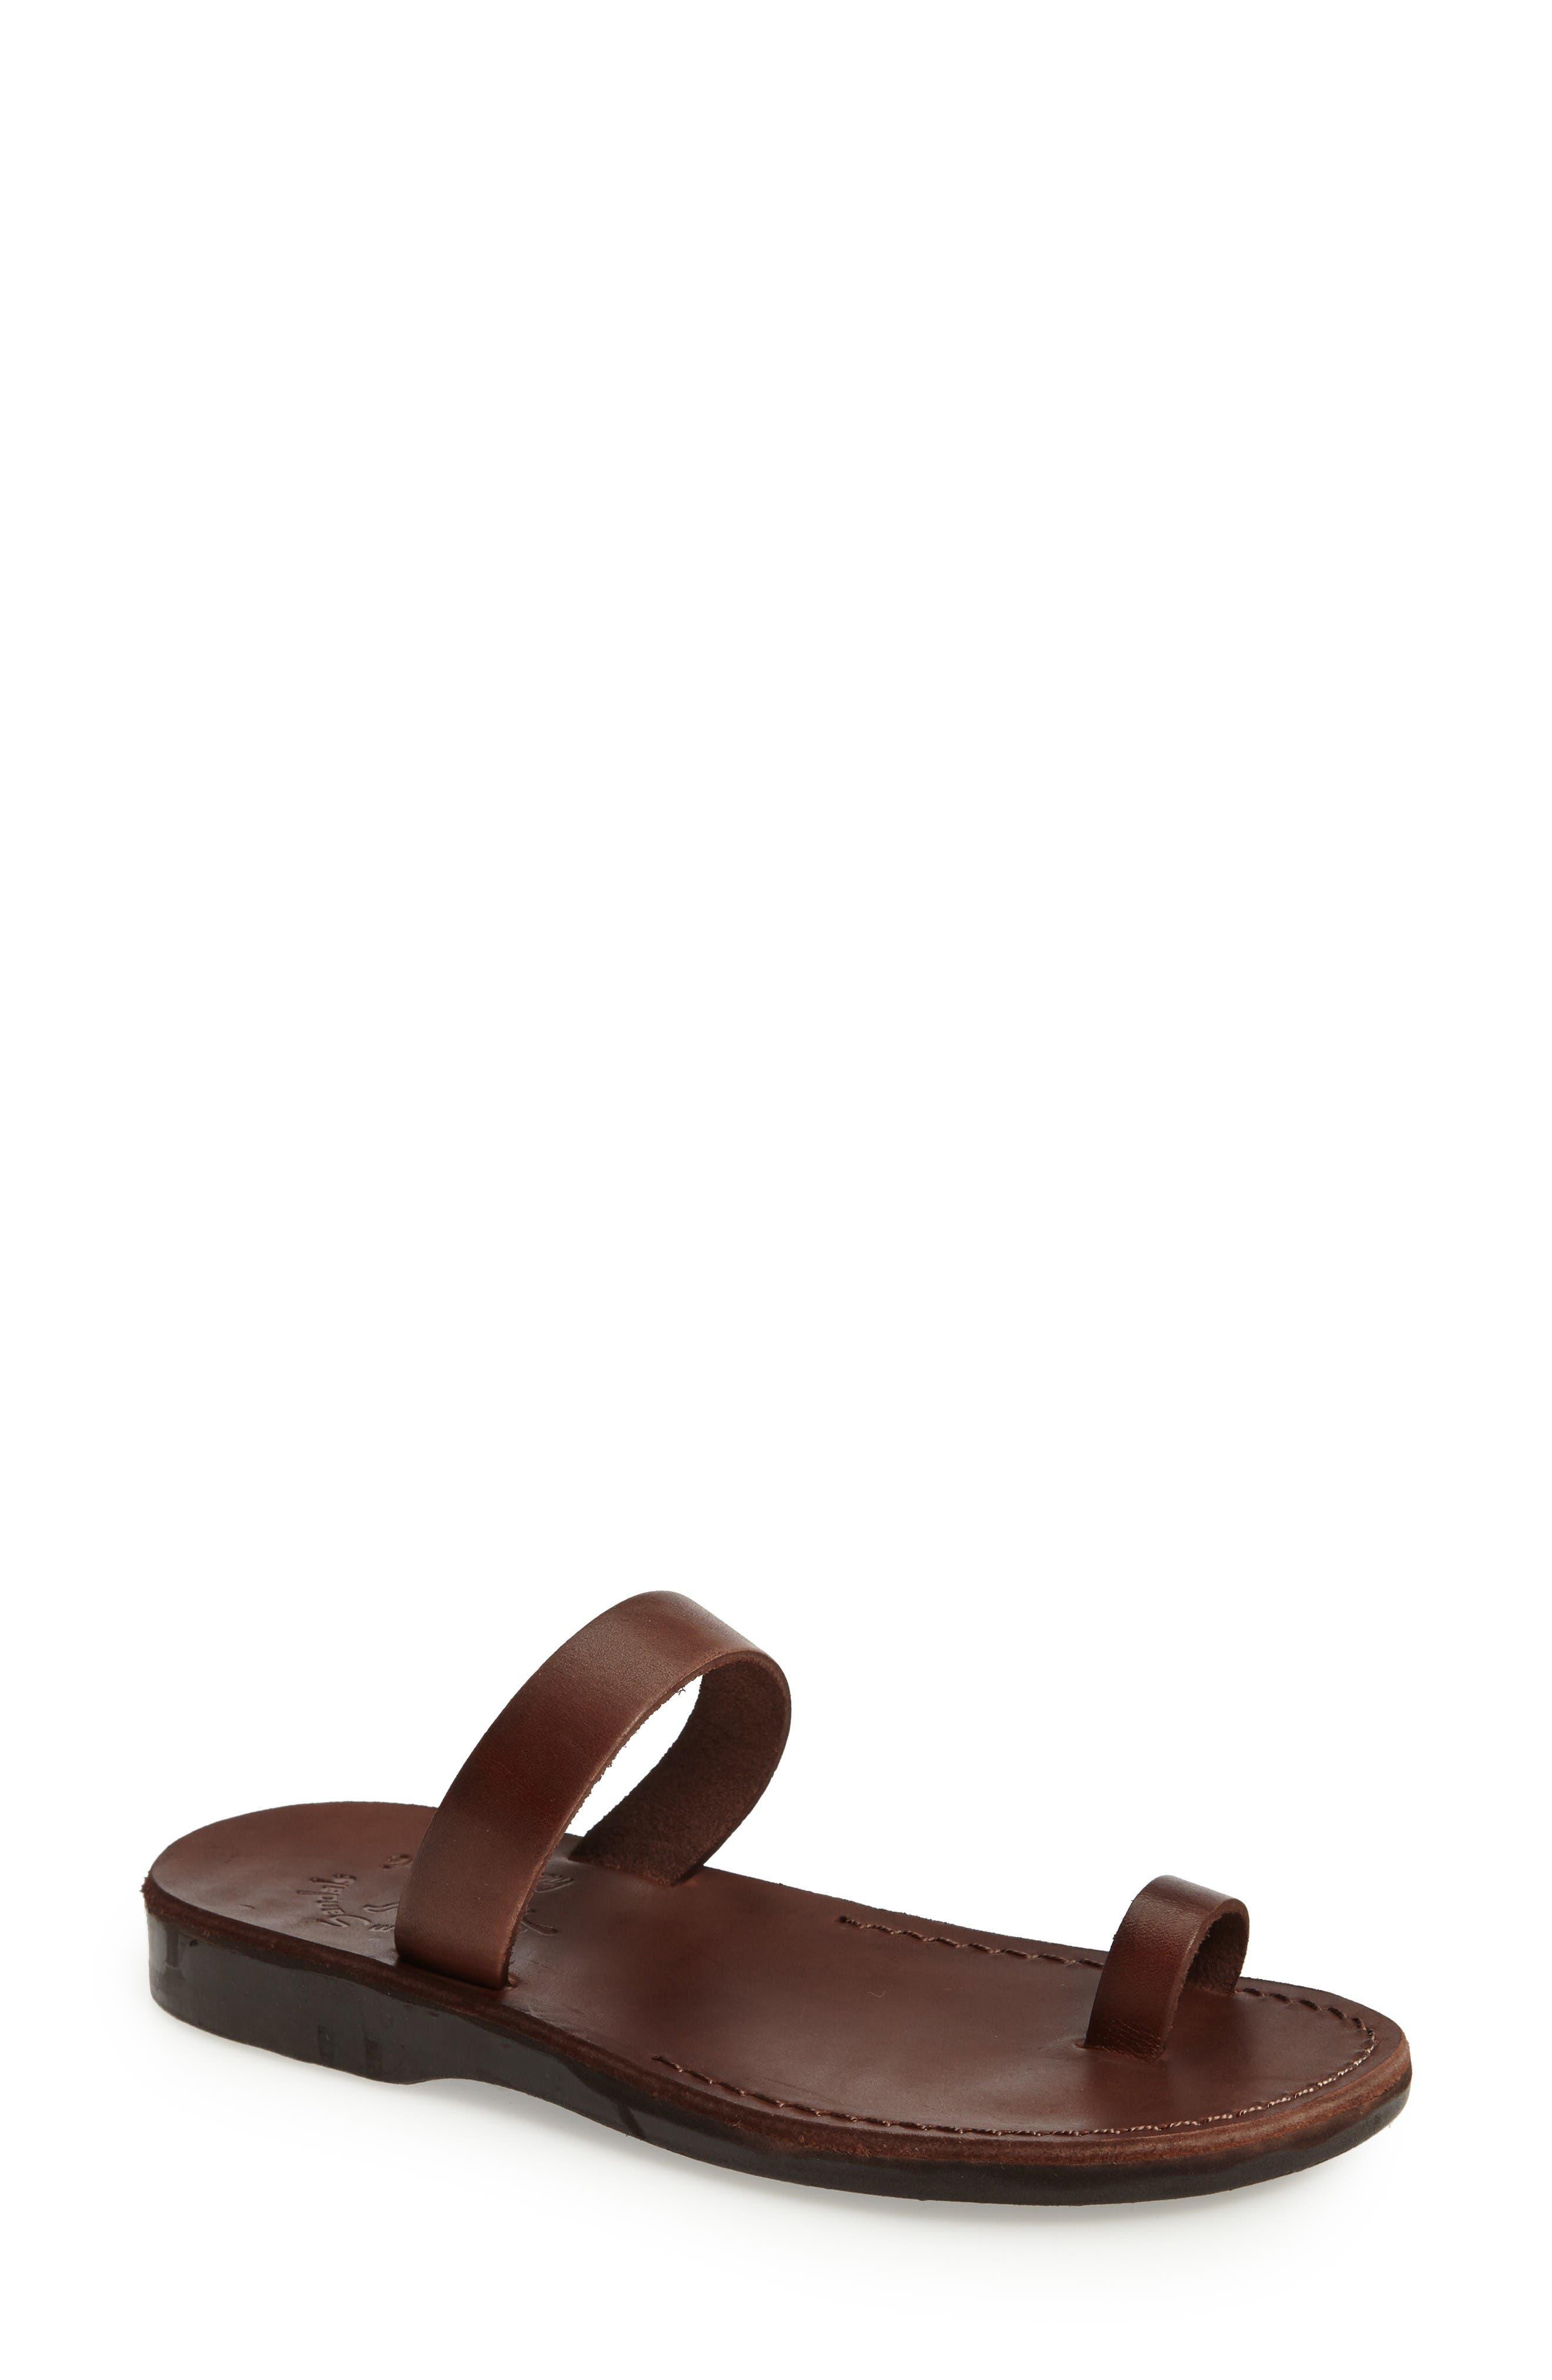 Main Image - Jerusalem Sandals Eden Toe Loop Sandal (Women)